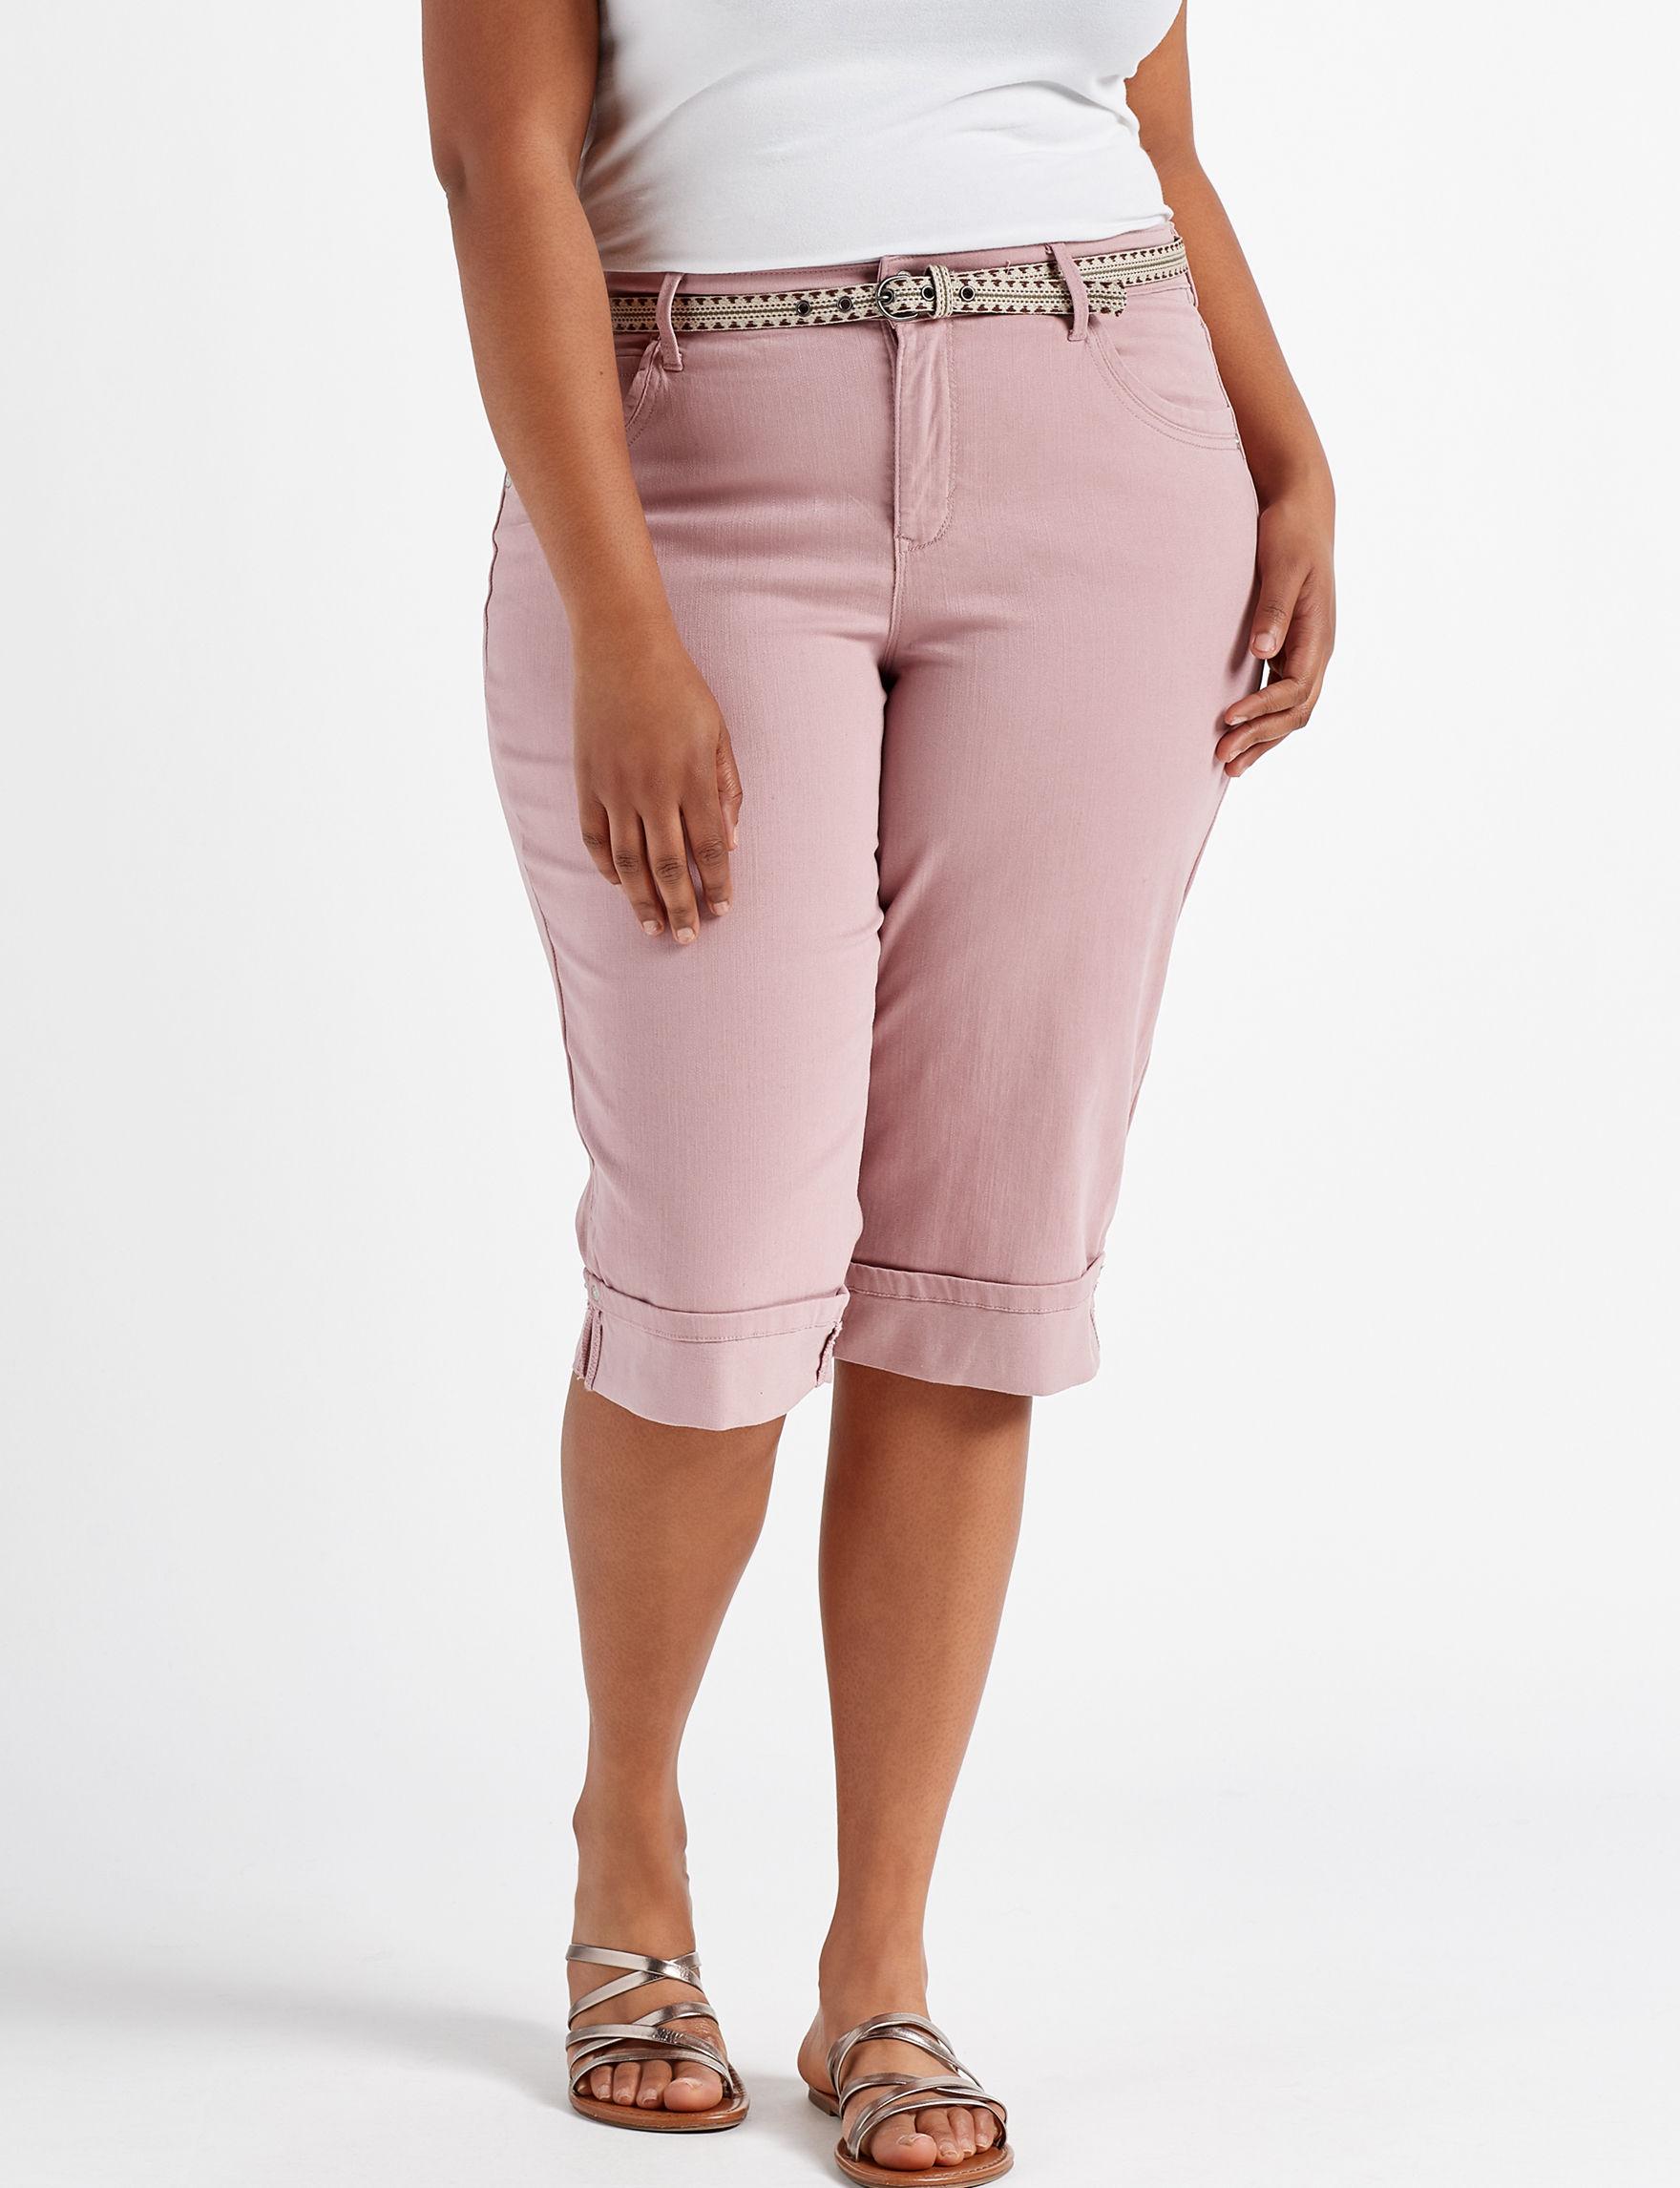 Gloria Vanderbilt Pink Capris & Crops